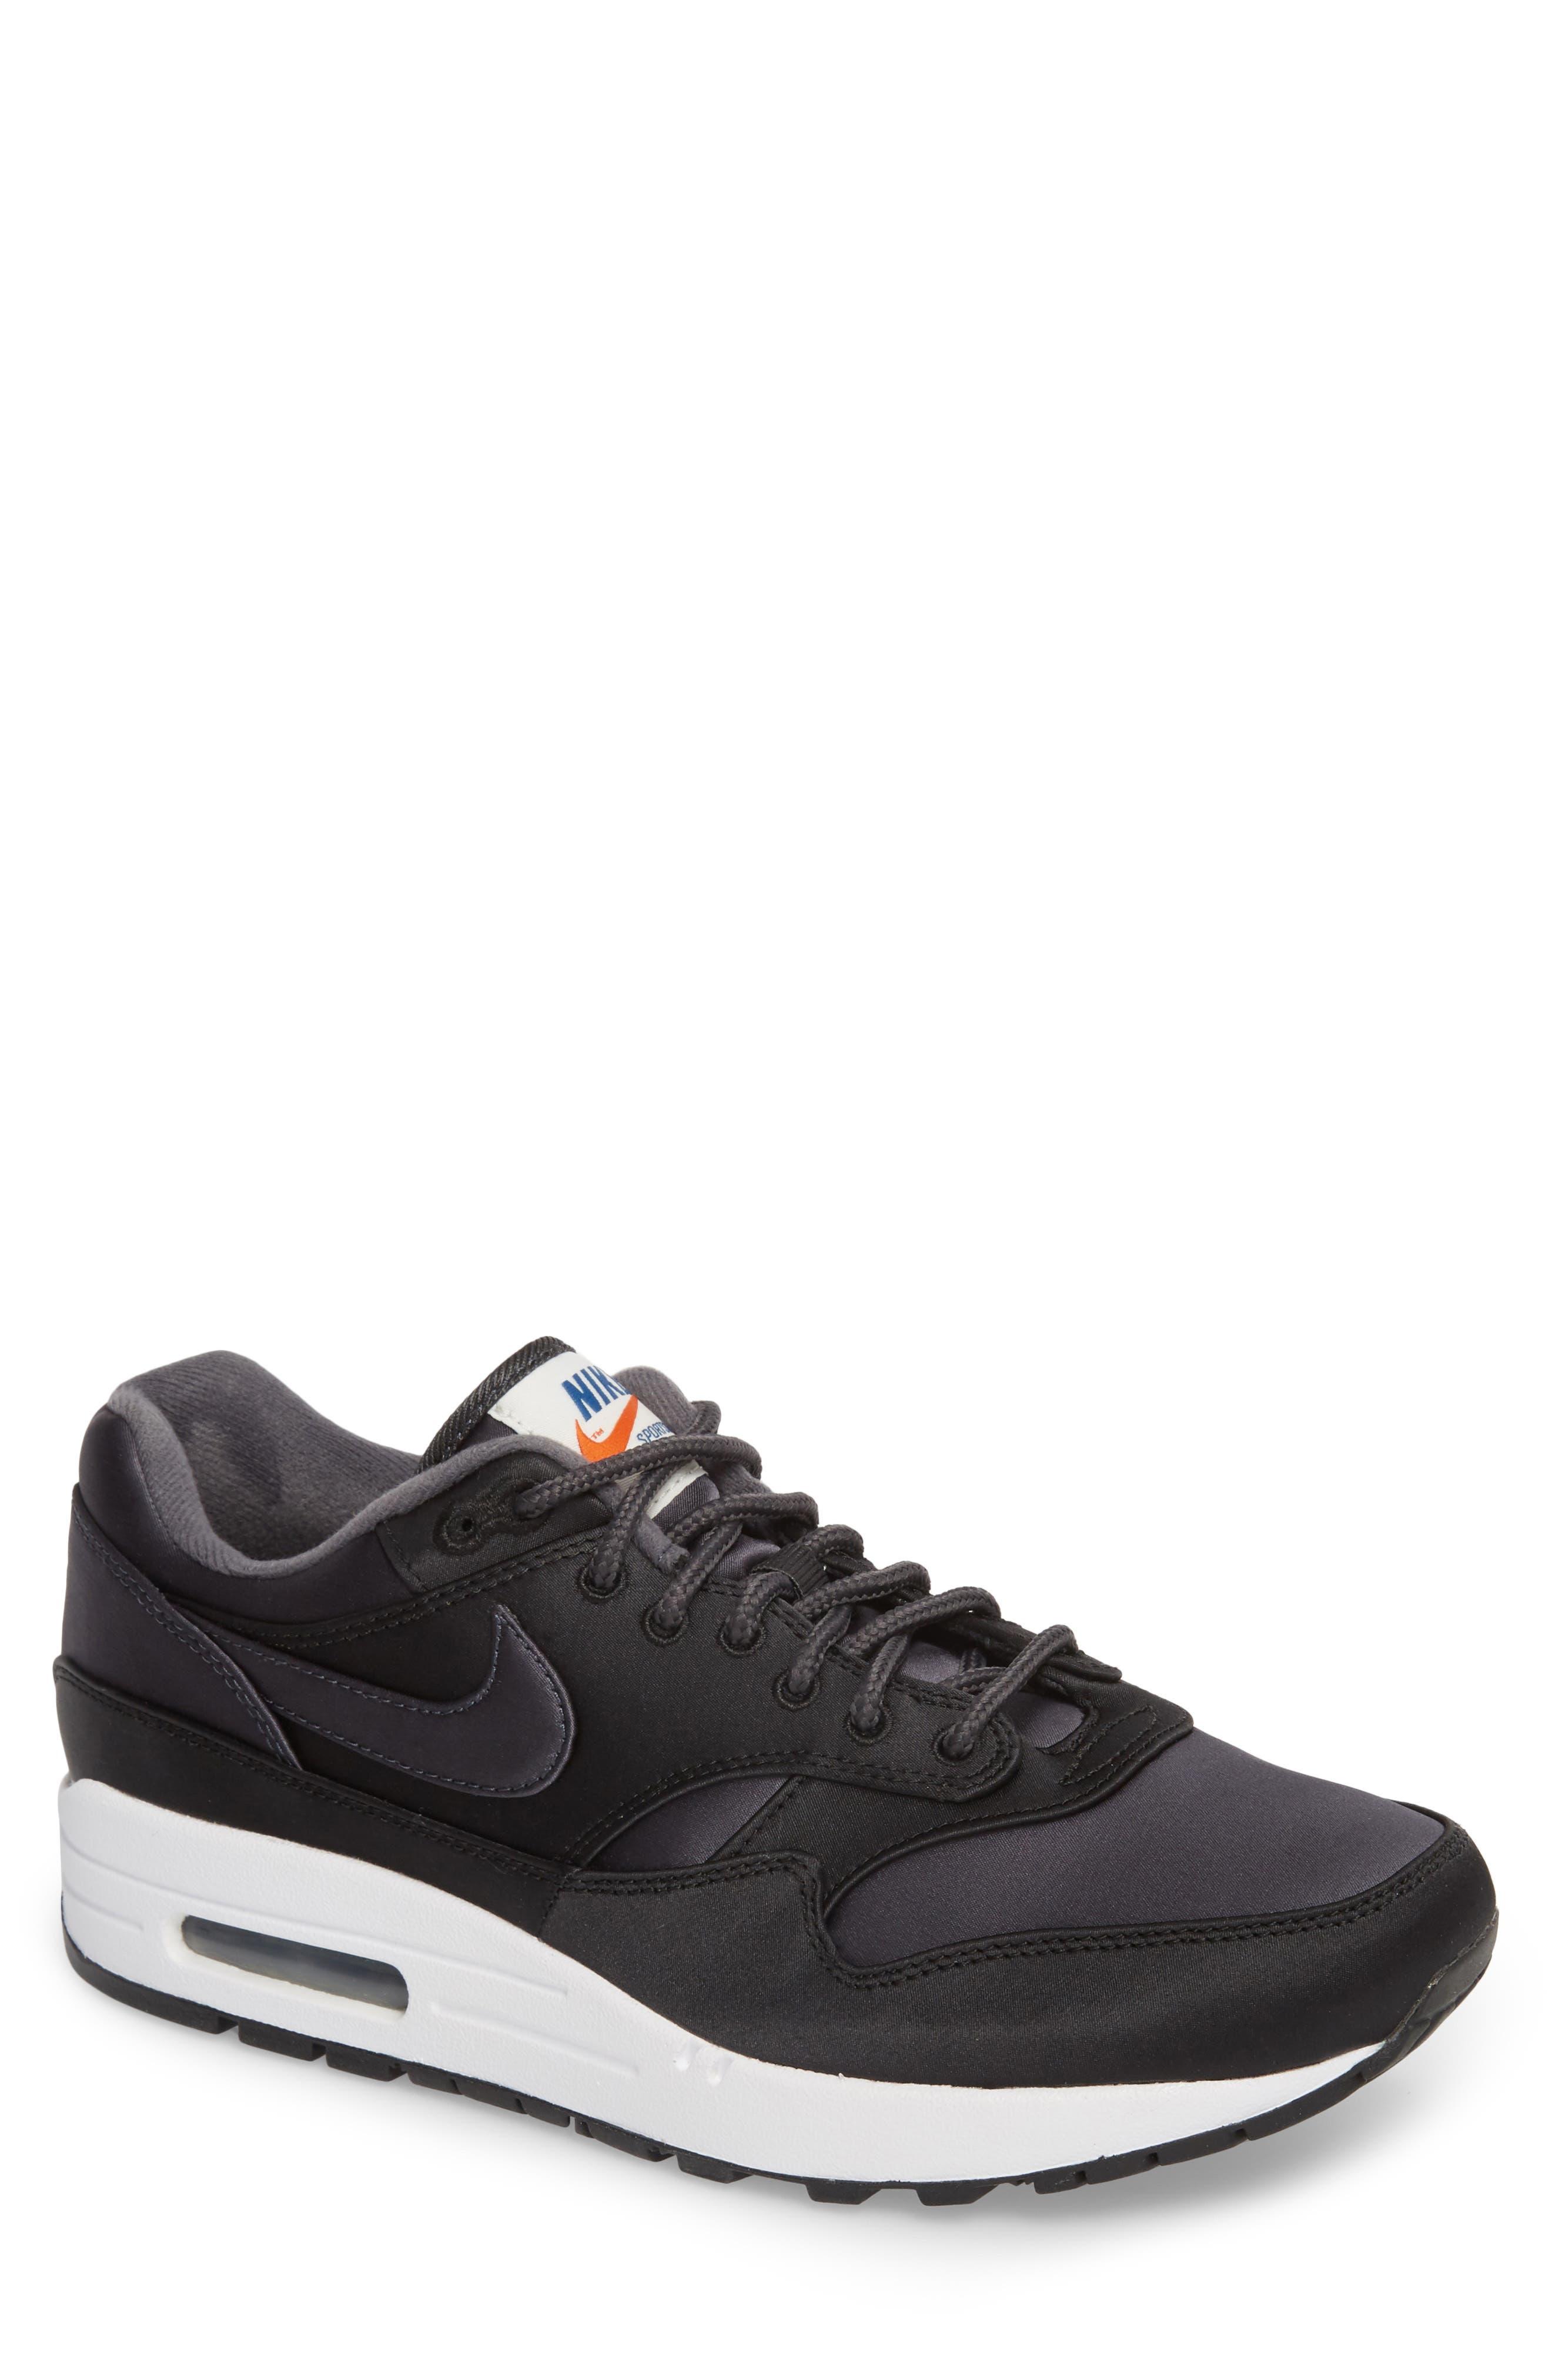 Air Max 1 SE Sneaker,                             Main thumbnail 1, color,                             Black/ Anthracite/ White